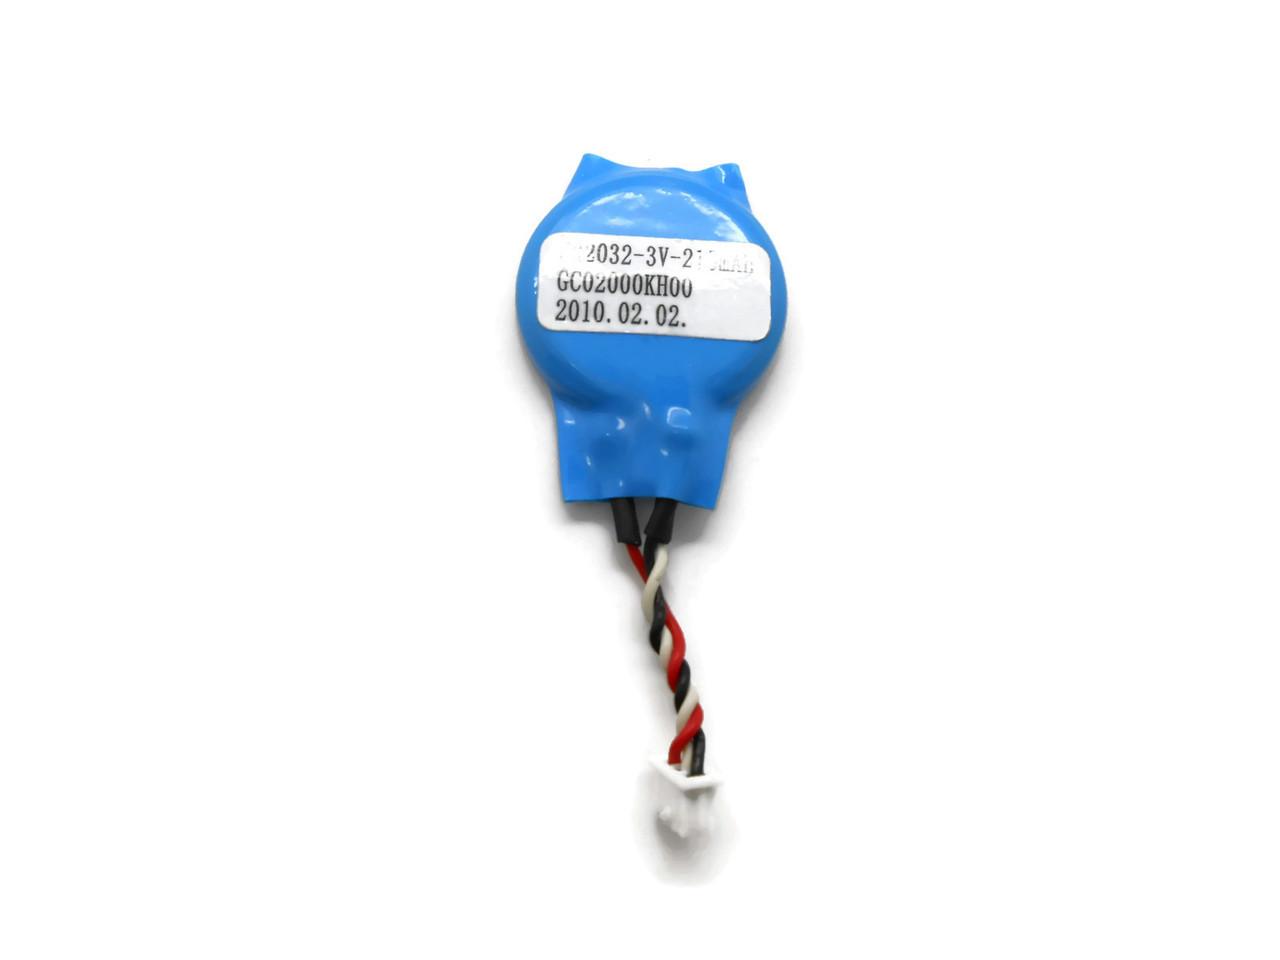 New Genuine Dell Latitude E6400 CMOS RTC Battery GC02000KH00